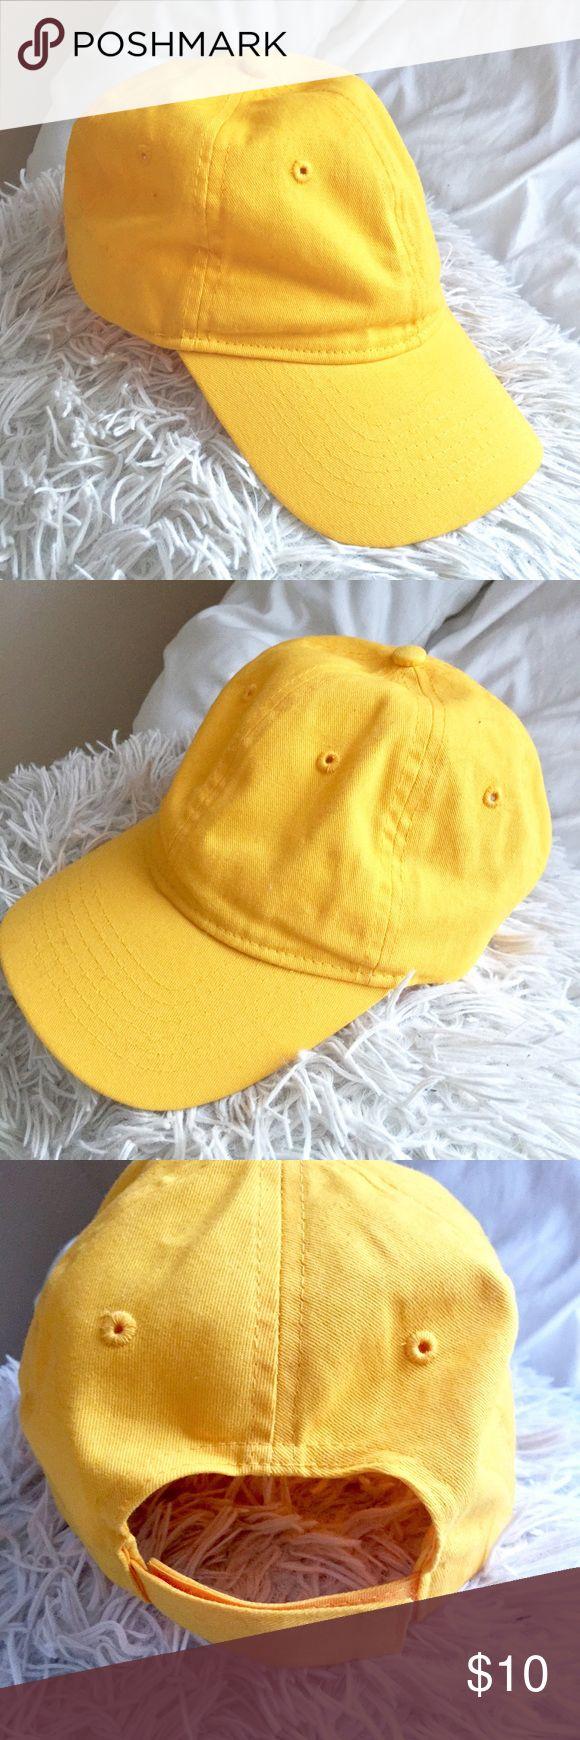 Bright Yellow Plain Baseball Cap More of a golden banana yellow. Never been worn Accessories Hats